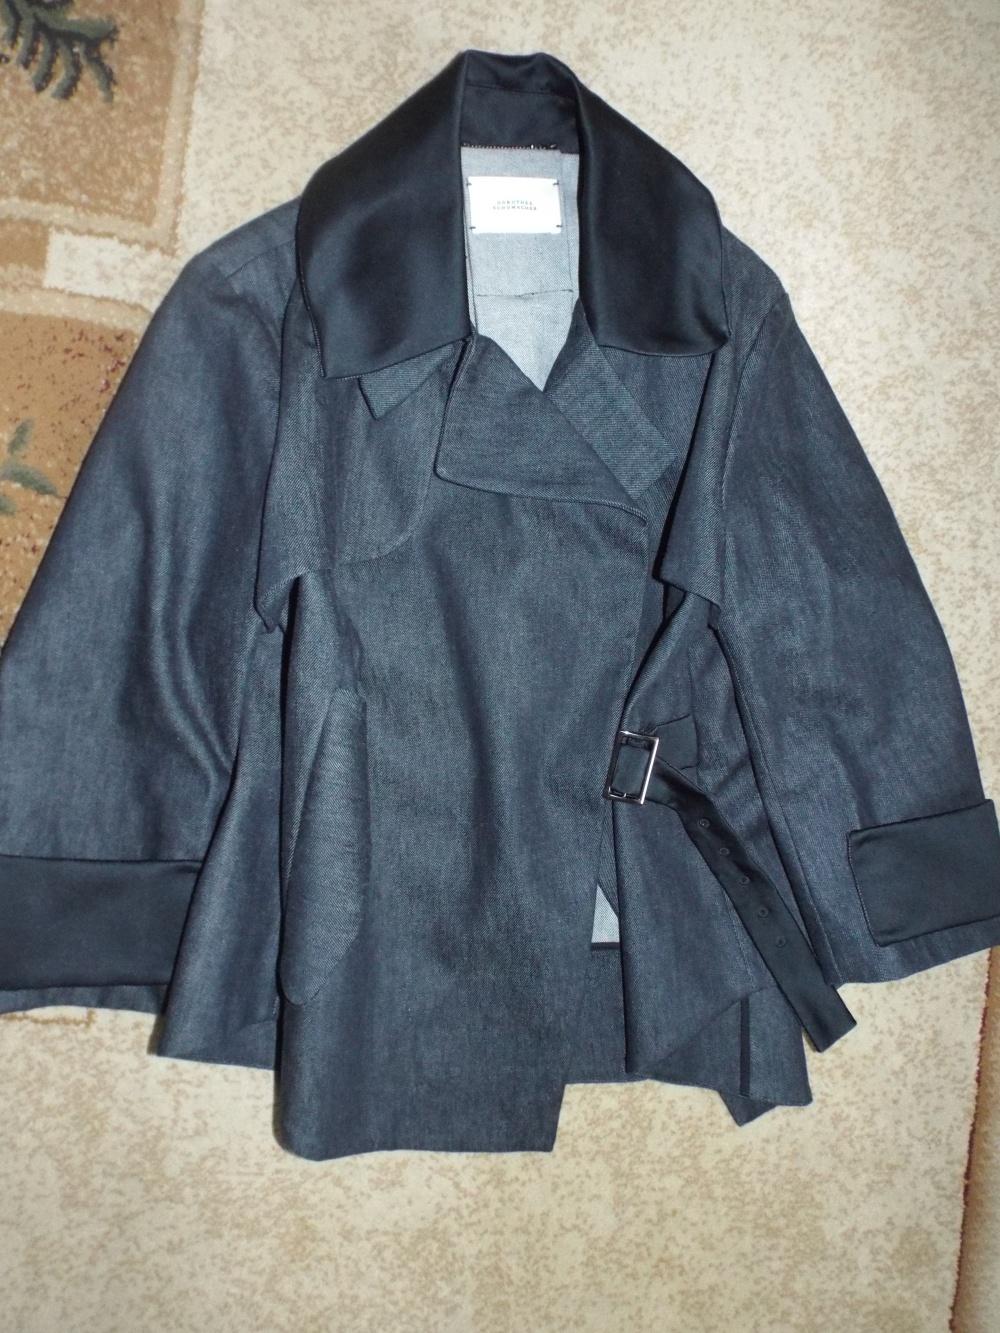 Жакет (куртка) Dorothee Schumacher, размер 44, 44-46, 46 (росс.).